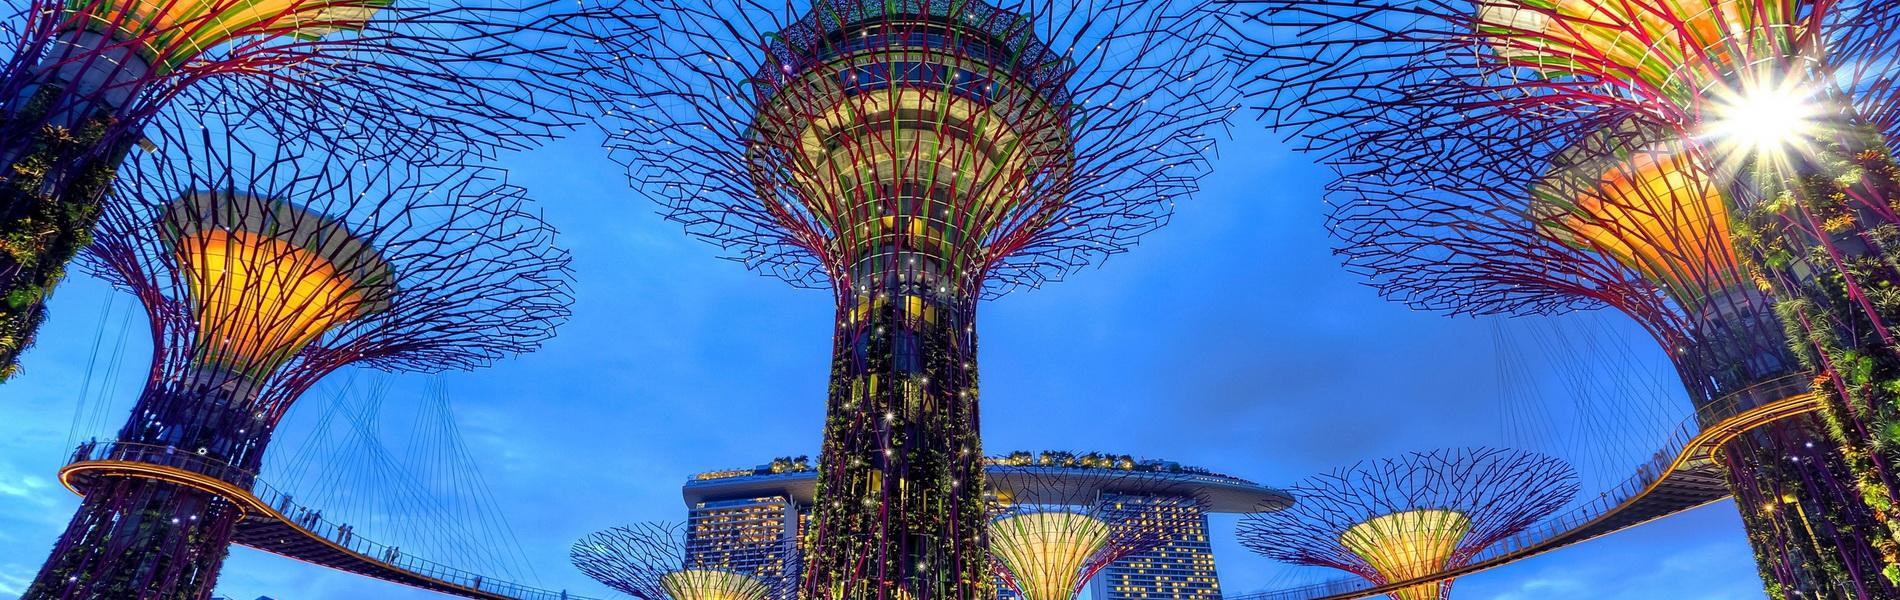 Supertrees und Marina Bay Sands, Singapur, Photo by Duy Nguyen on Unsplash